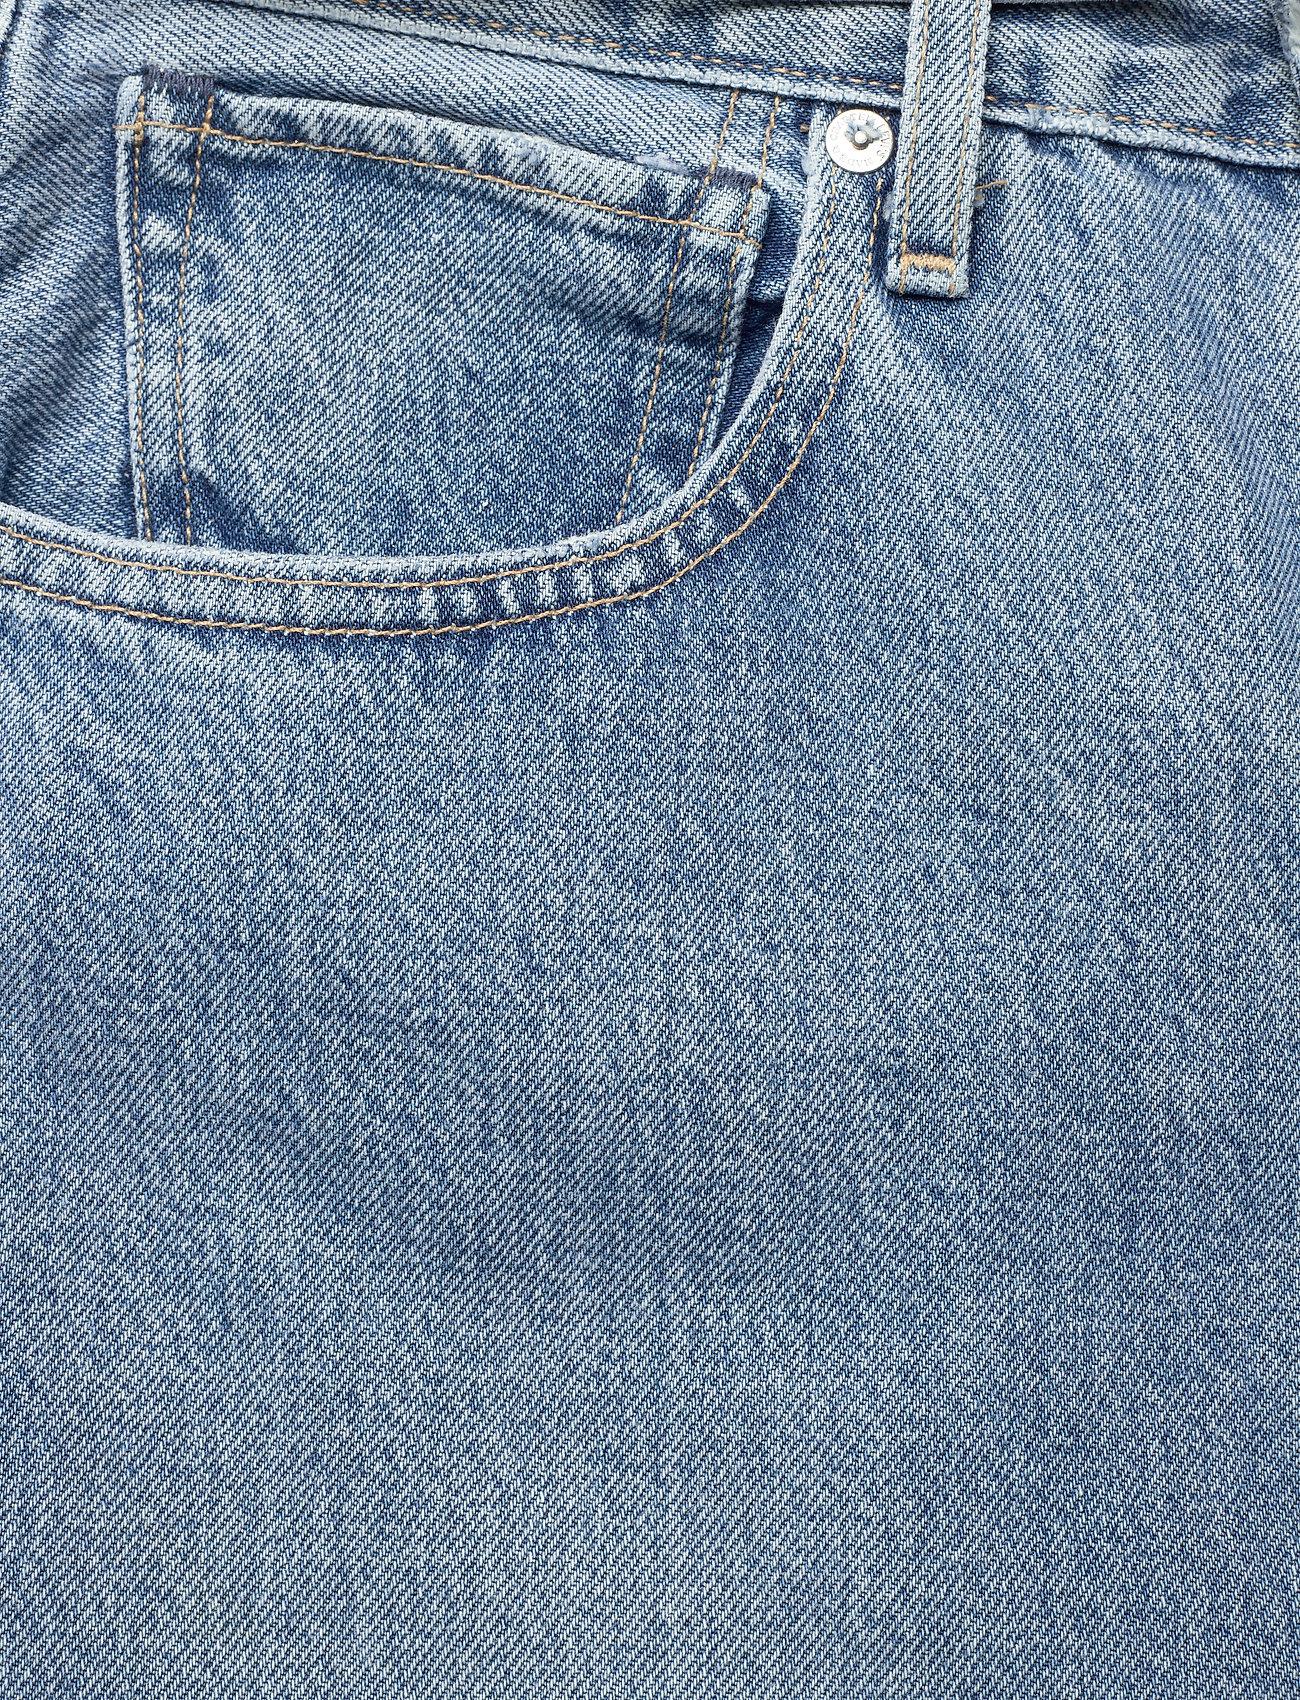 Levi's Made & Crafted - LMC BARREL LMC PALM BLUES - straight regular - med indigo - flat finish - 2